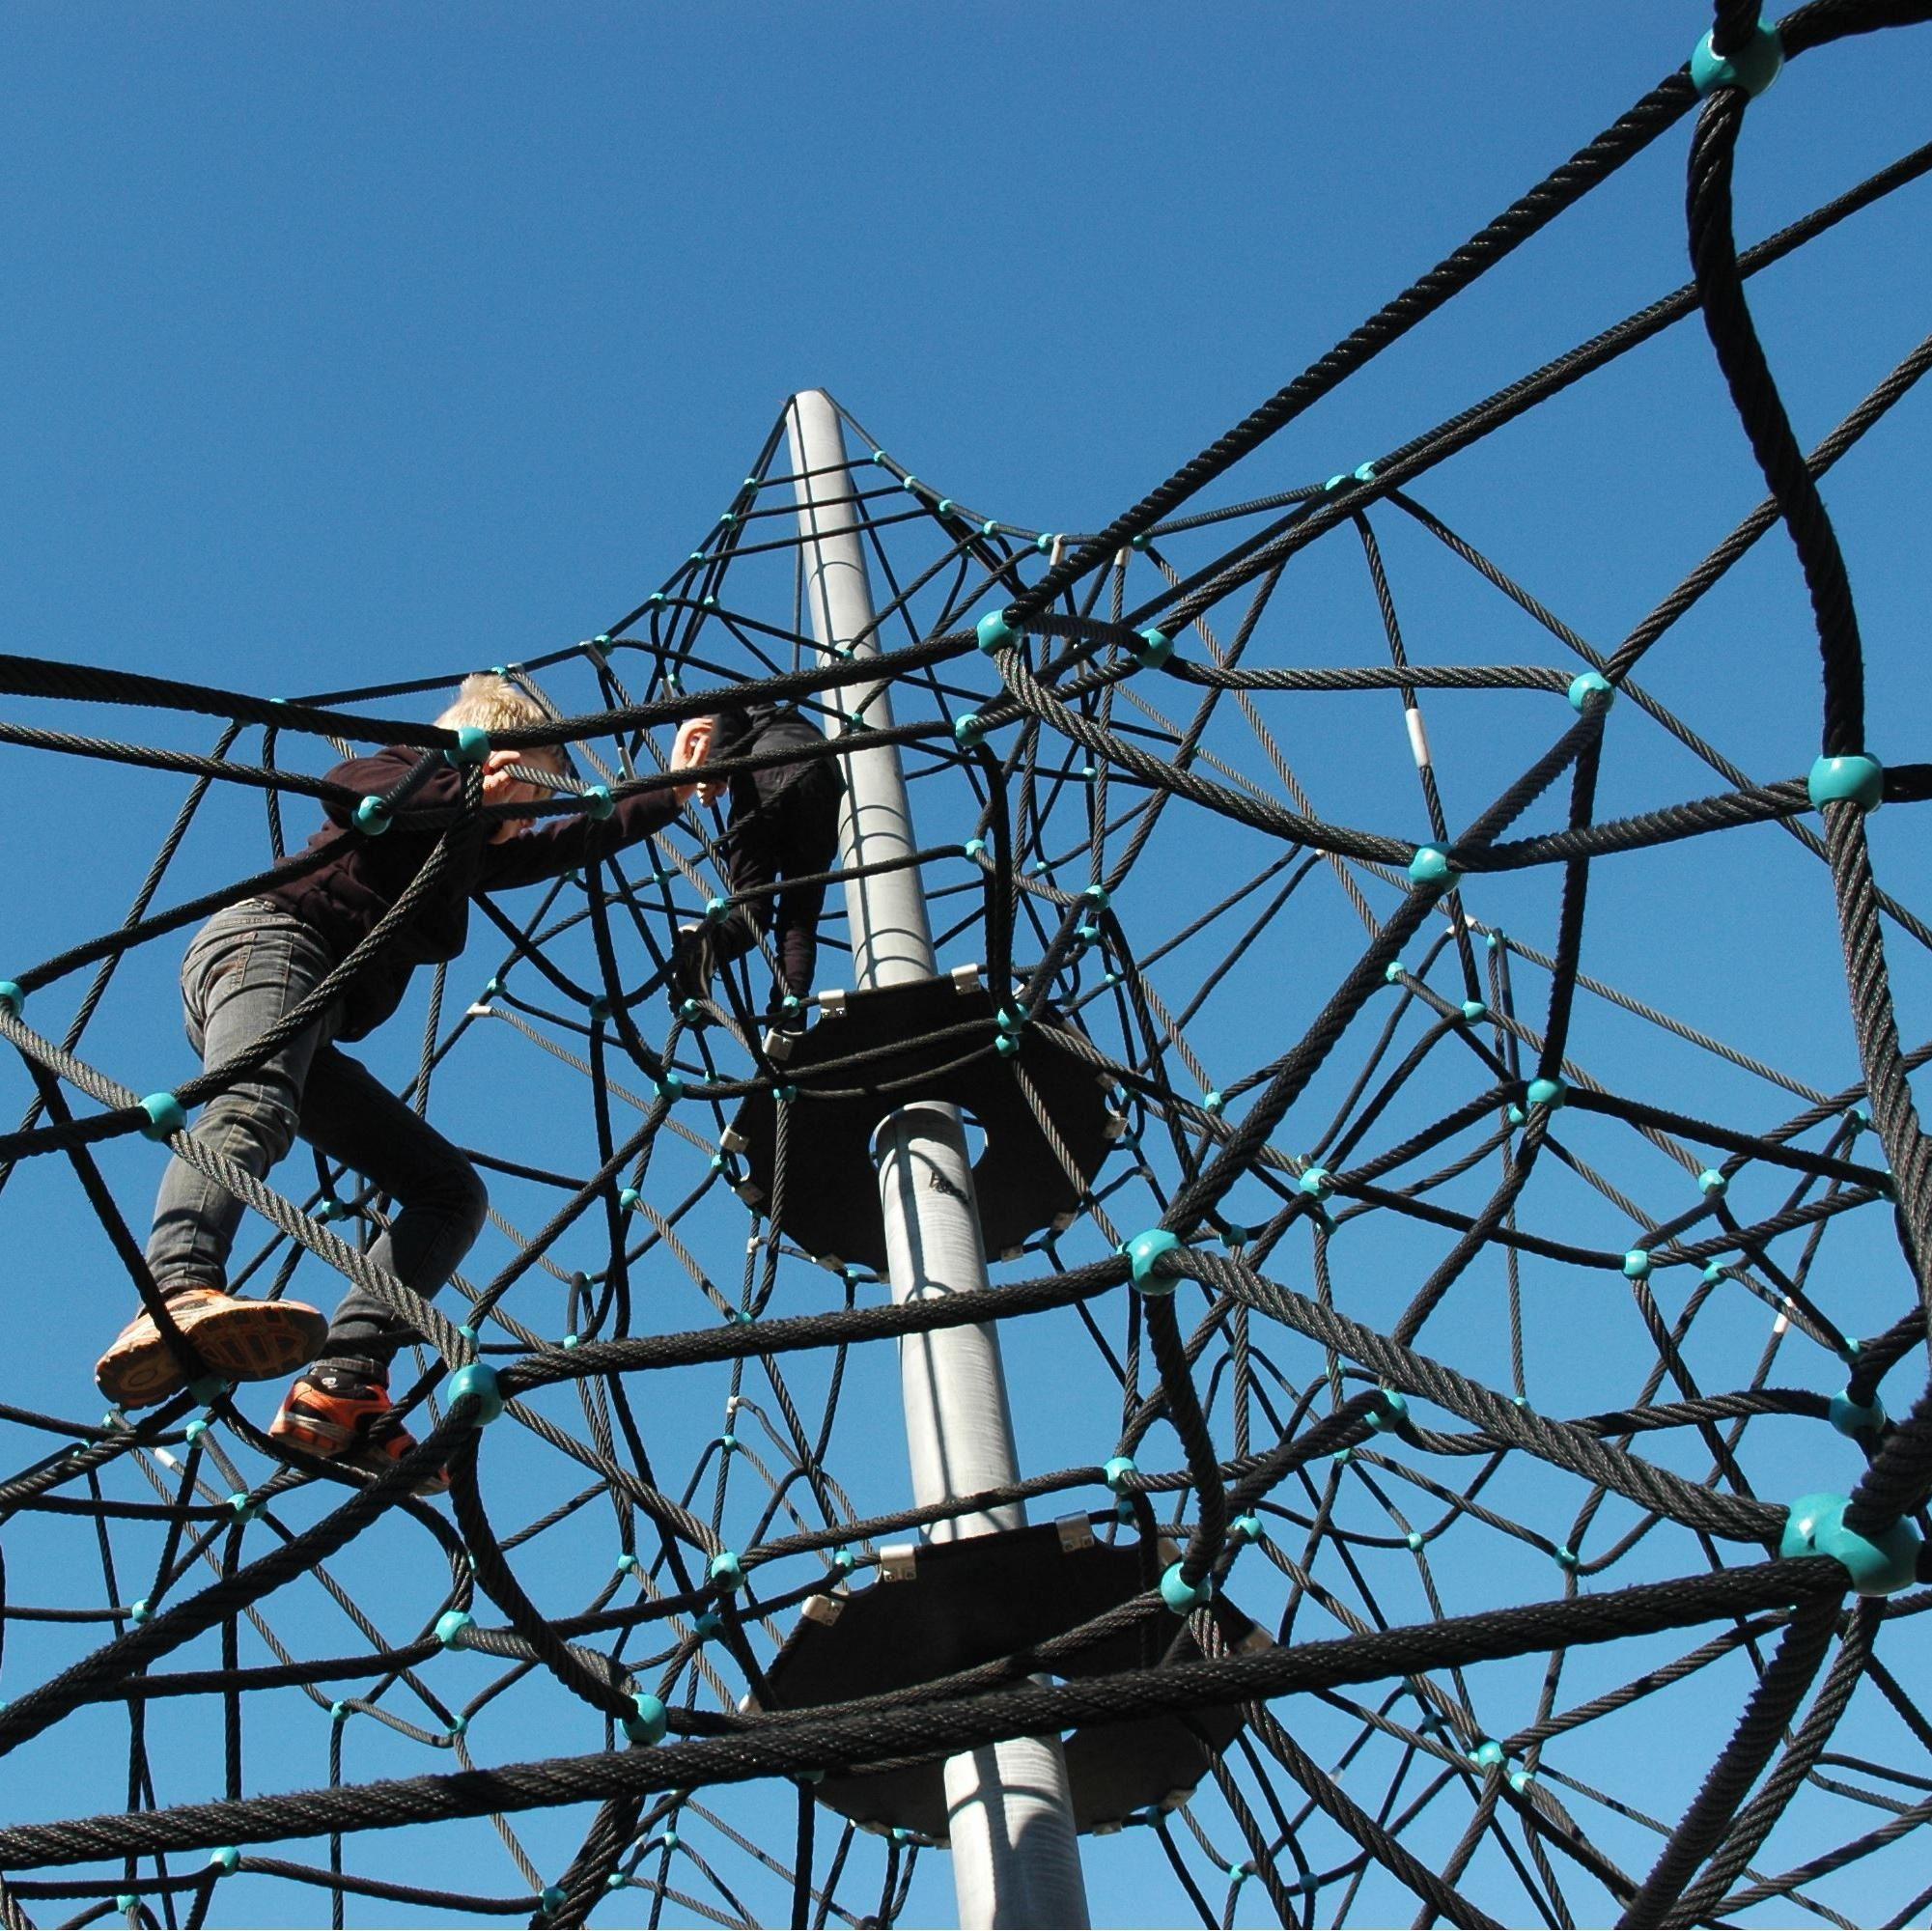 Lunds stadspark, Lunds kommun,  © Lunds stadspark, Lunds kommun, Lunds stadsparks lekplats